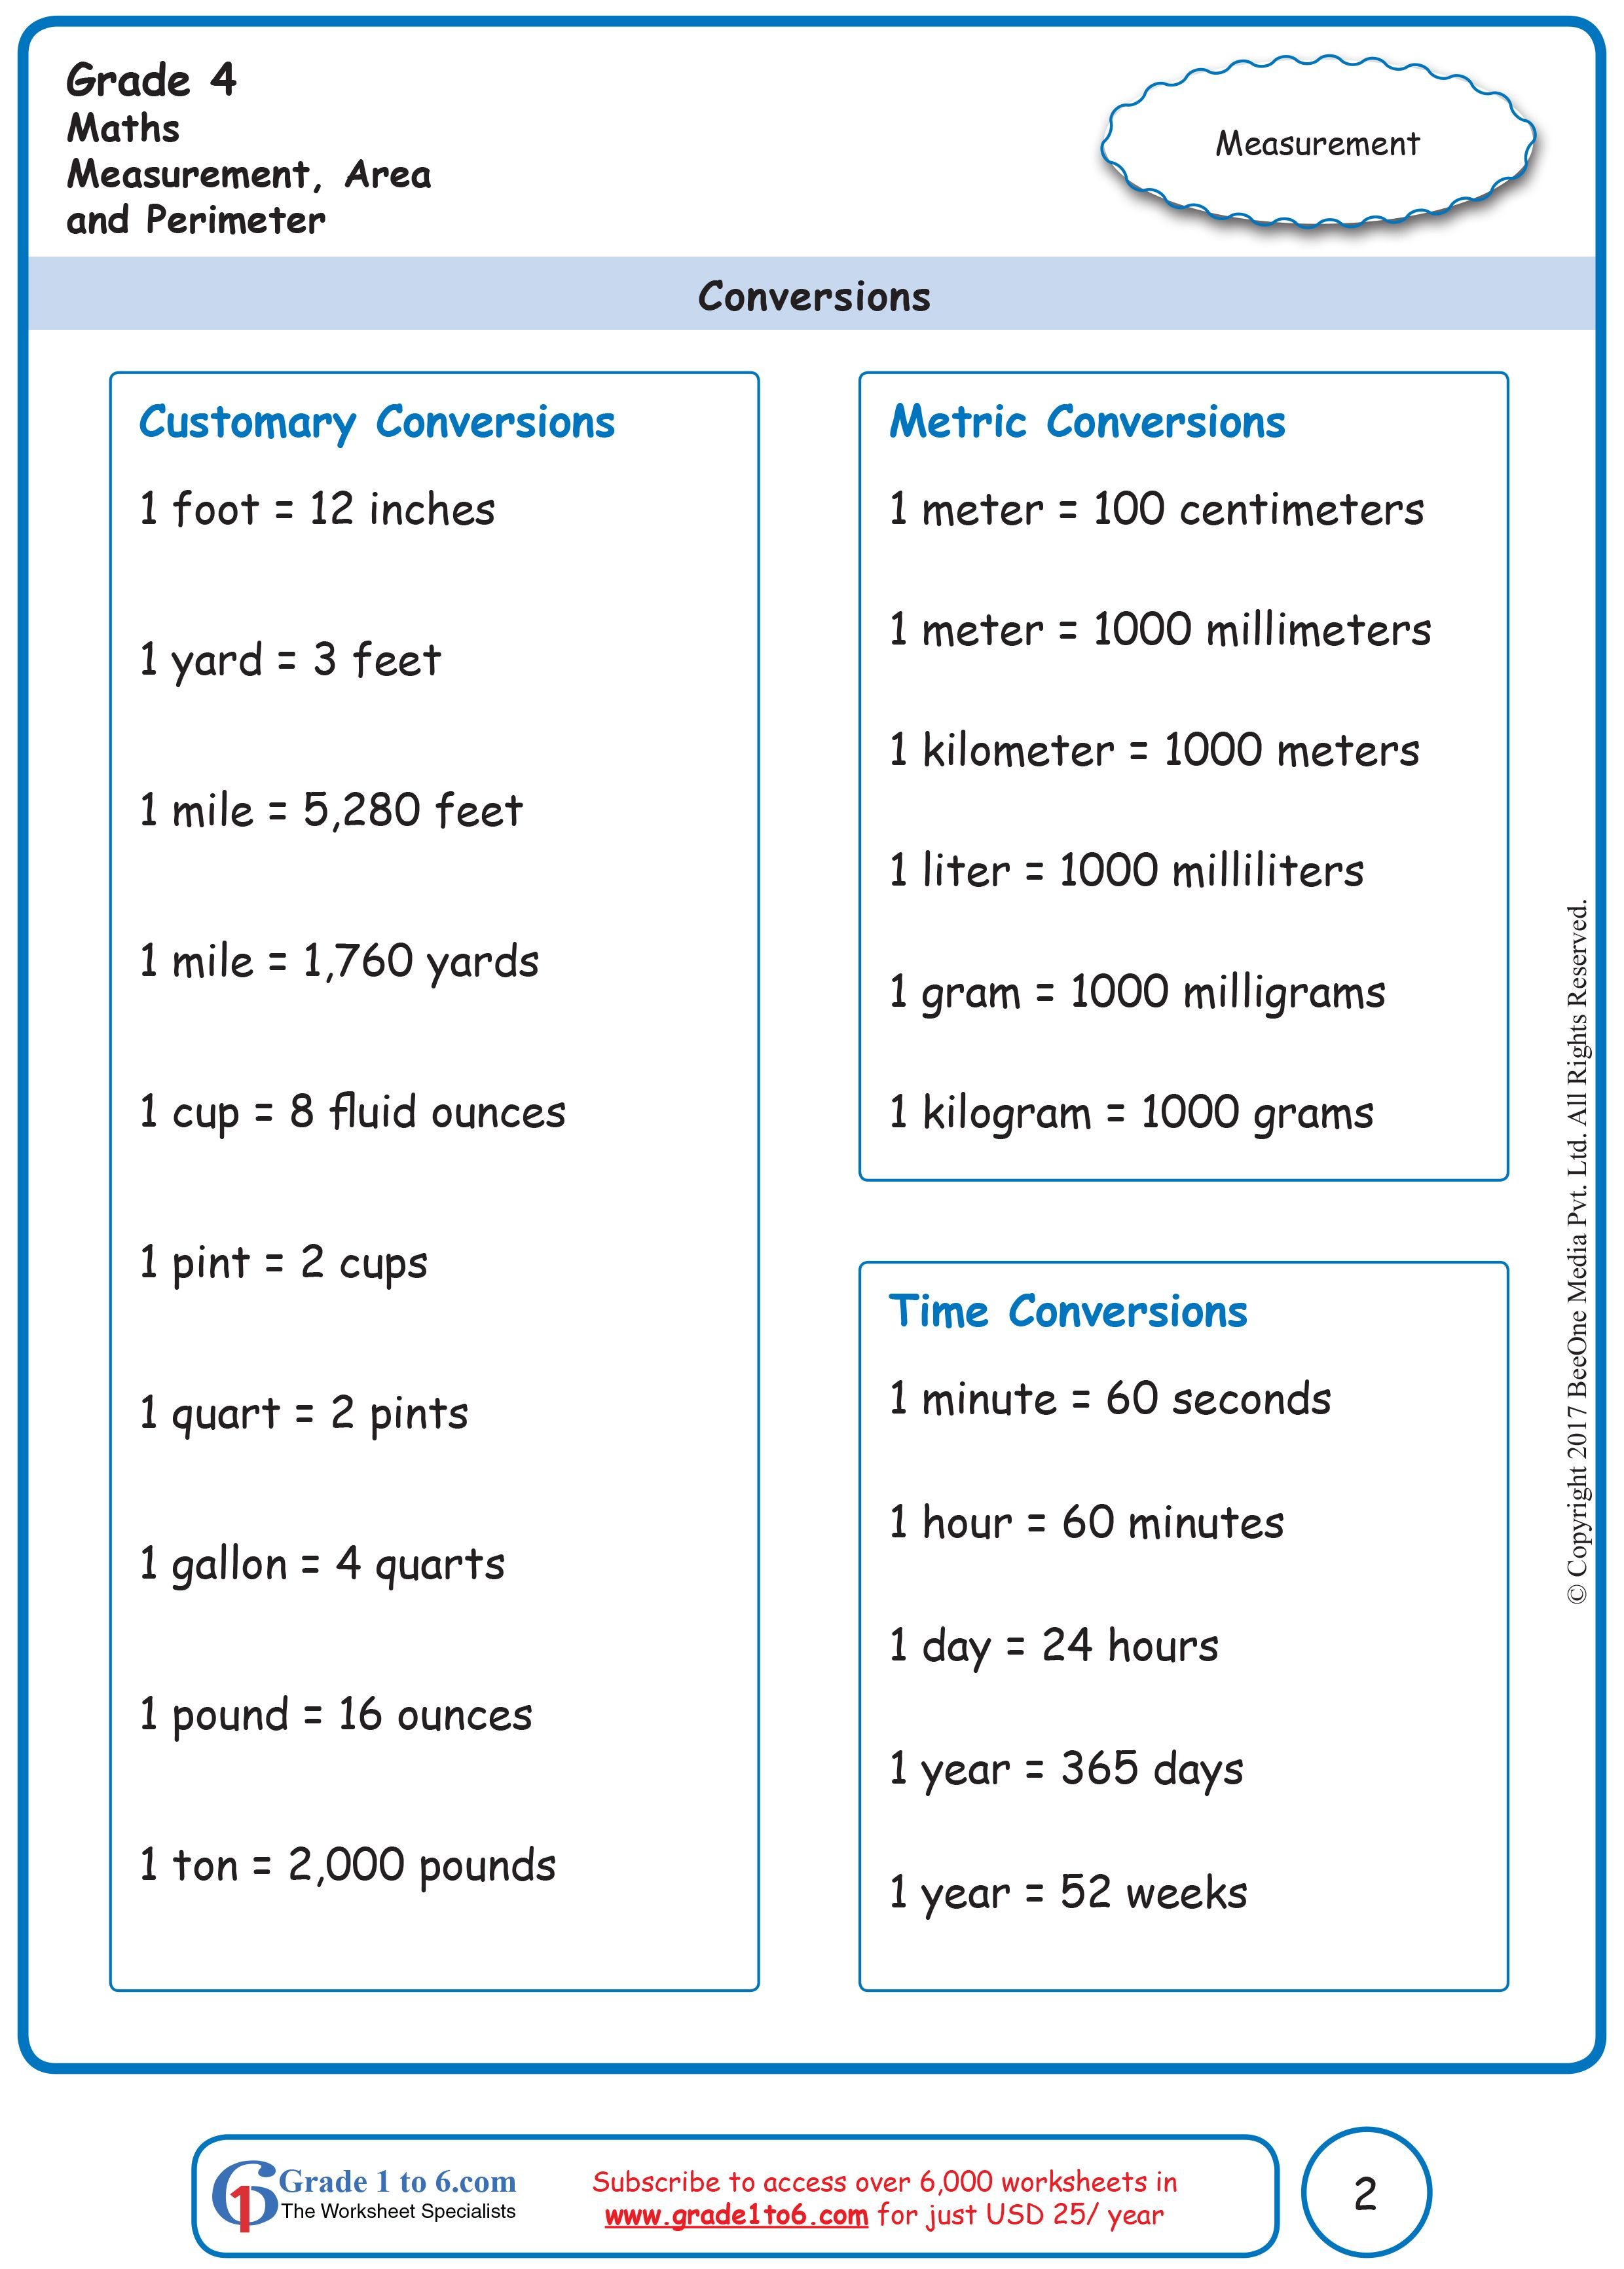 Measurement Conversions   Measurement worksheets [ 3464 x 2480 Pixel ]